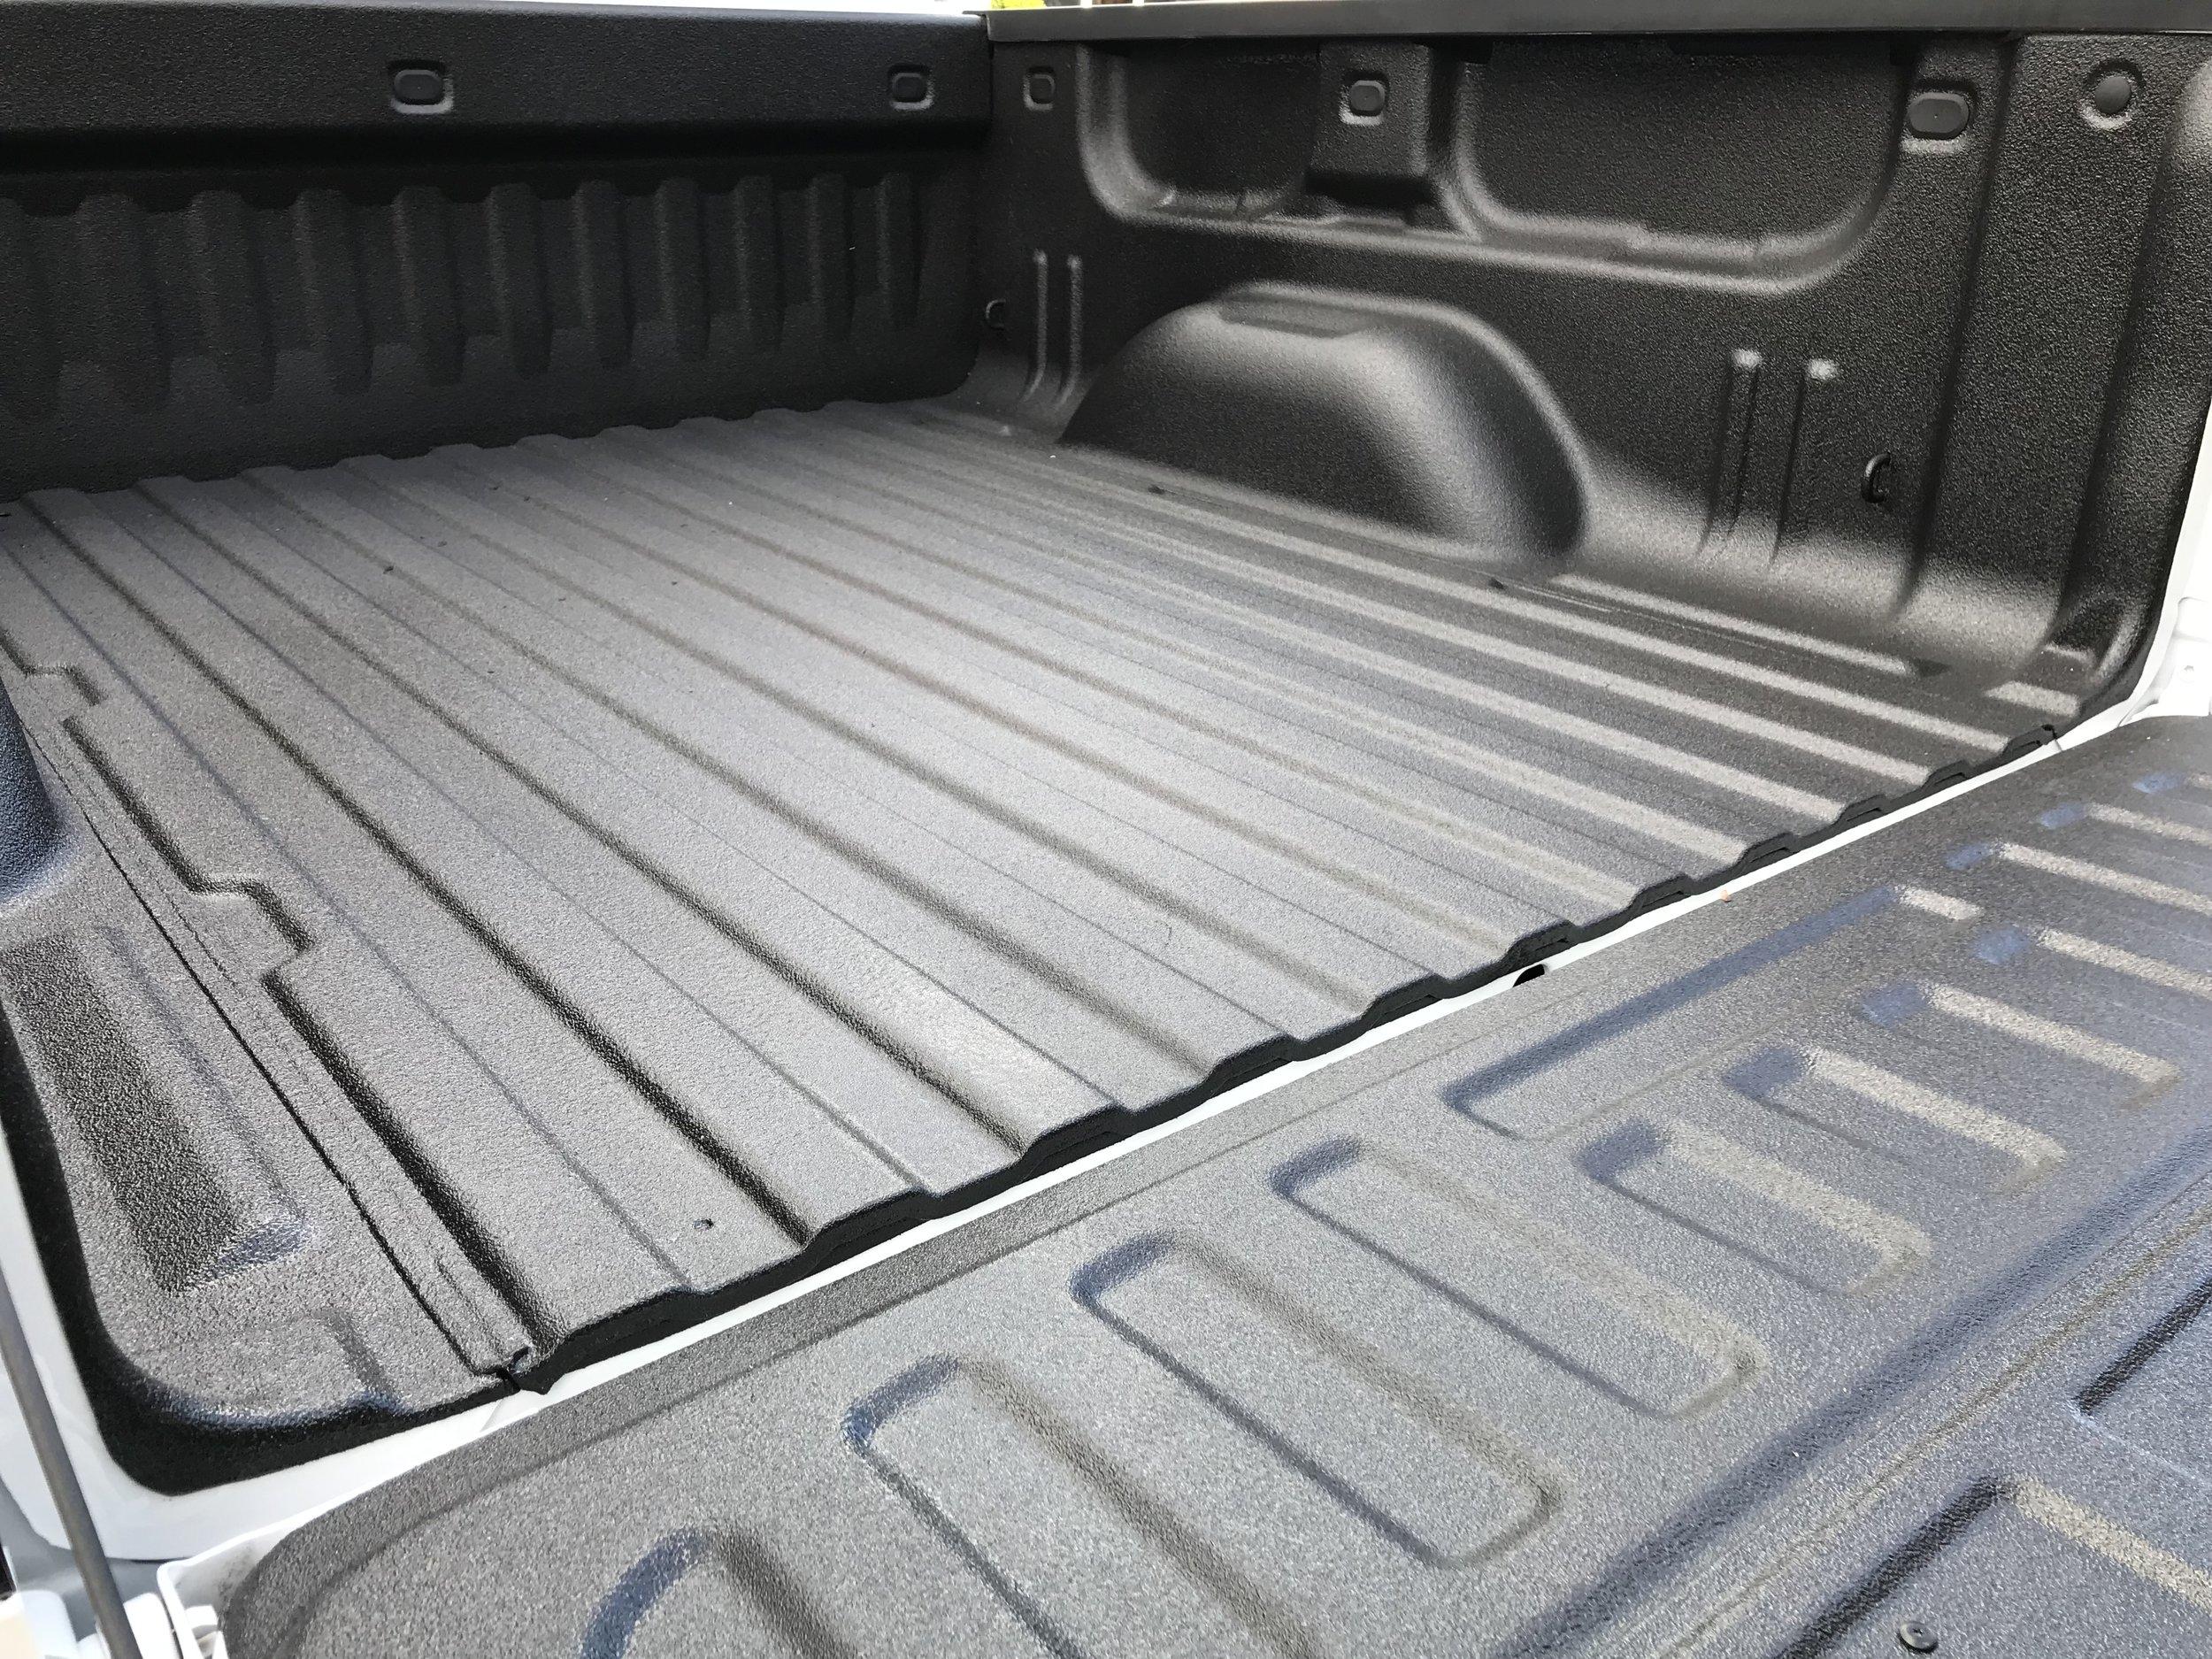 Spray In Bedliner >> Coastal Linings Spray On Bed Liners Truck Toolboxes